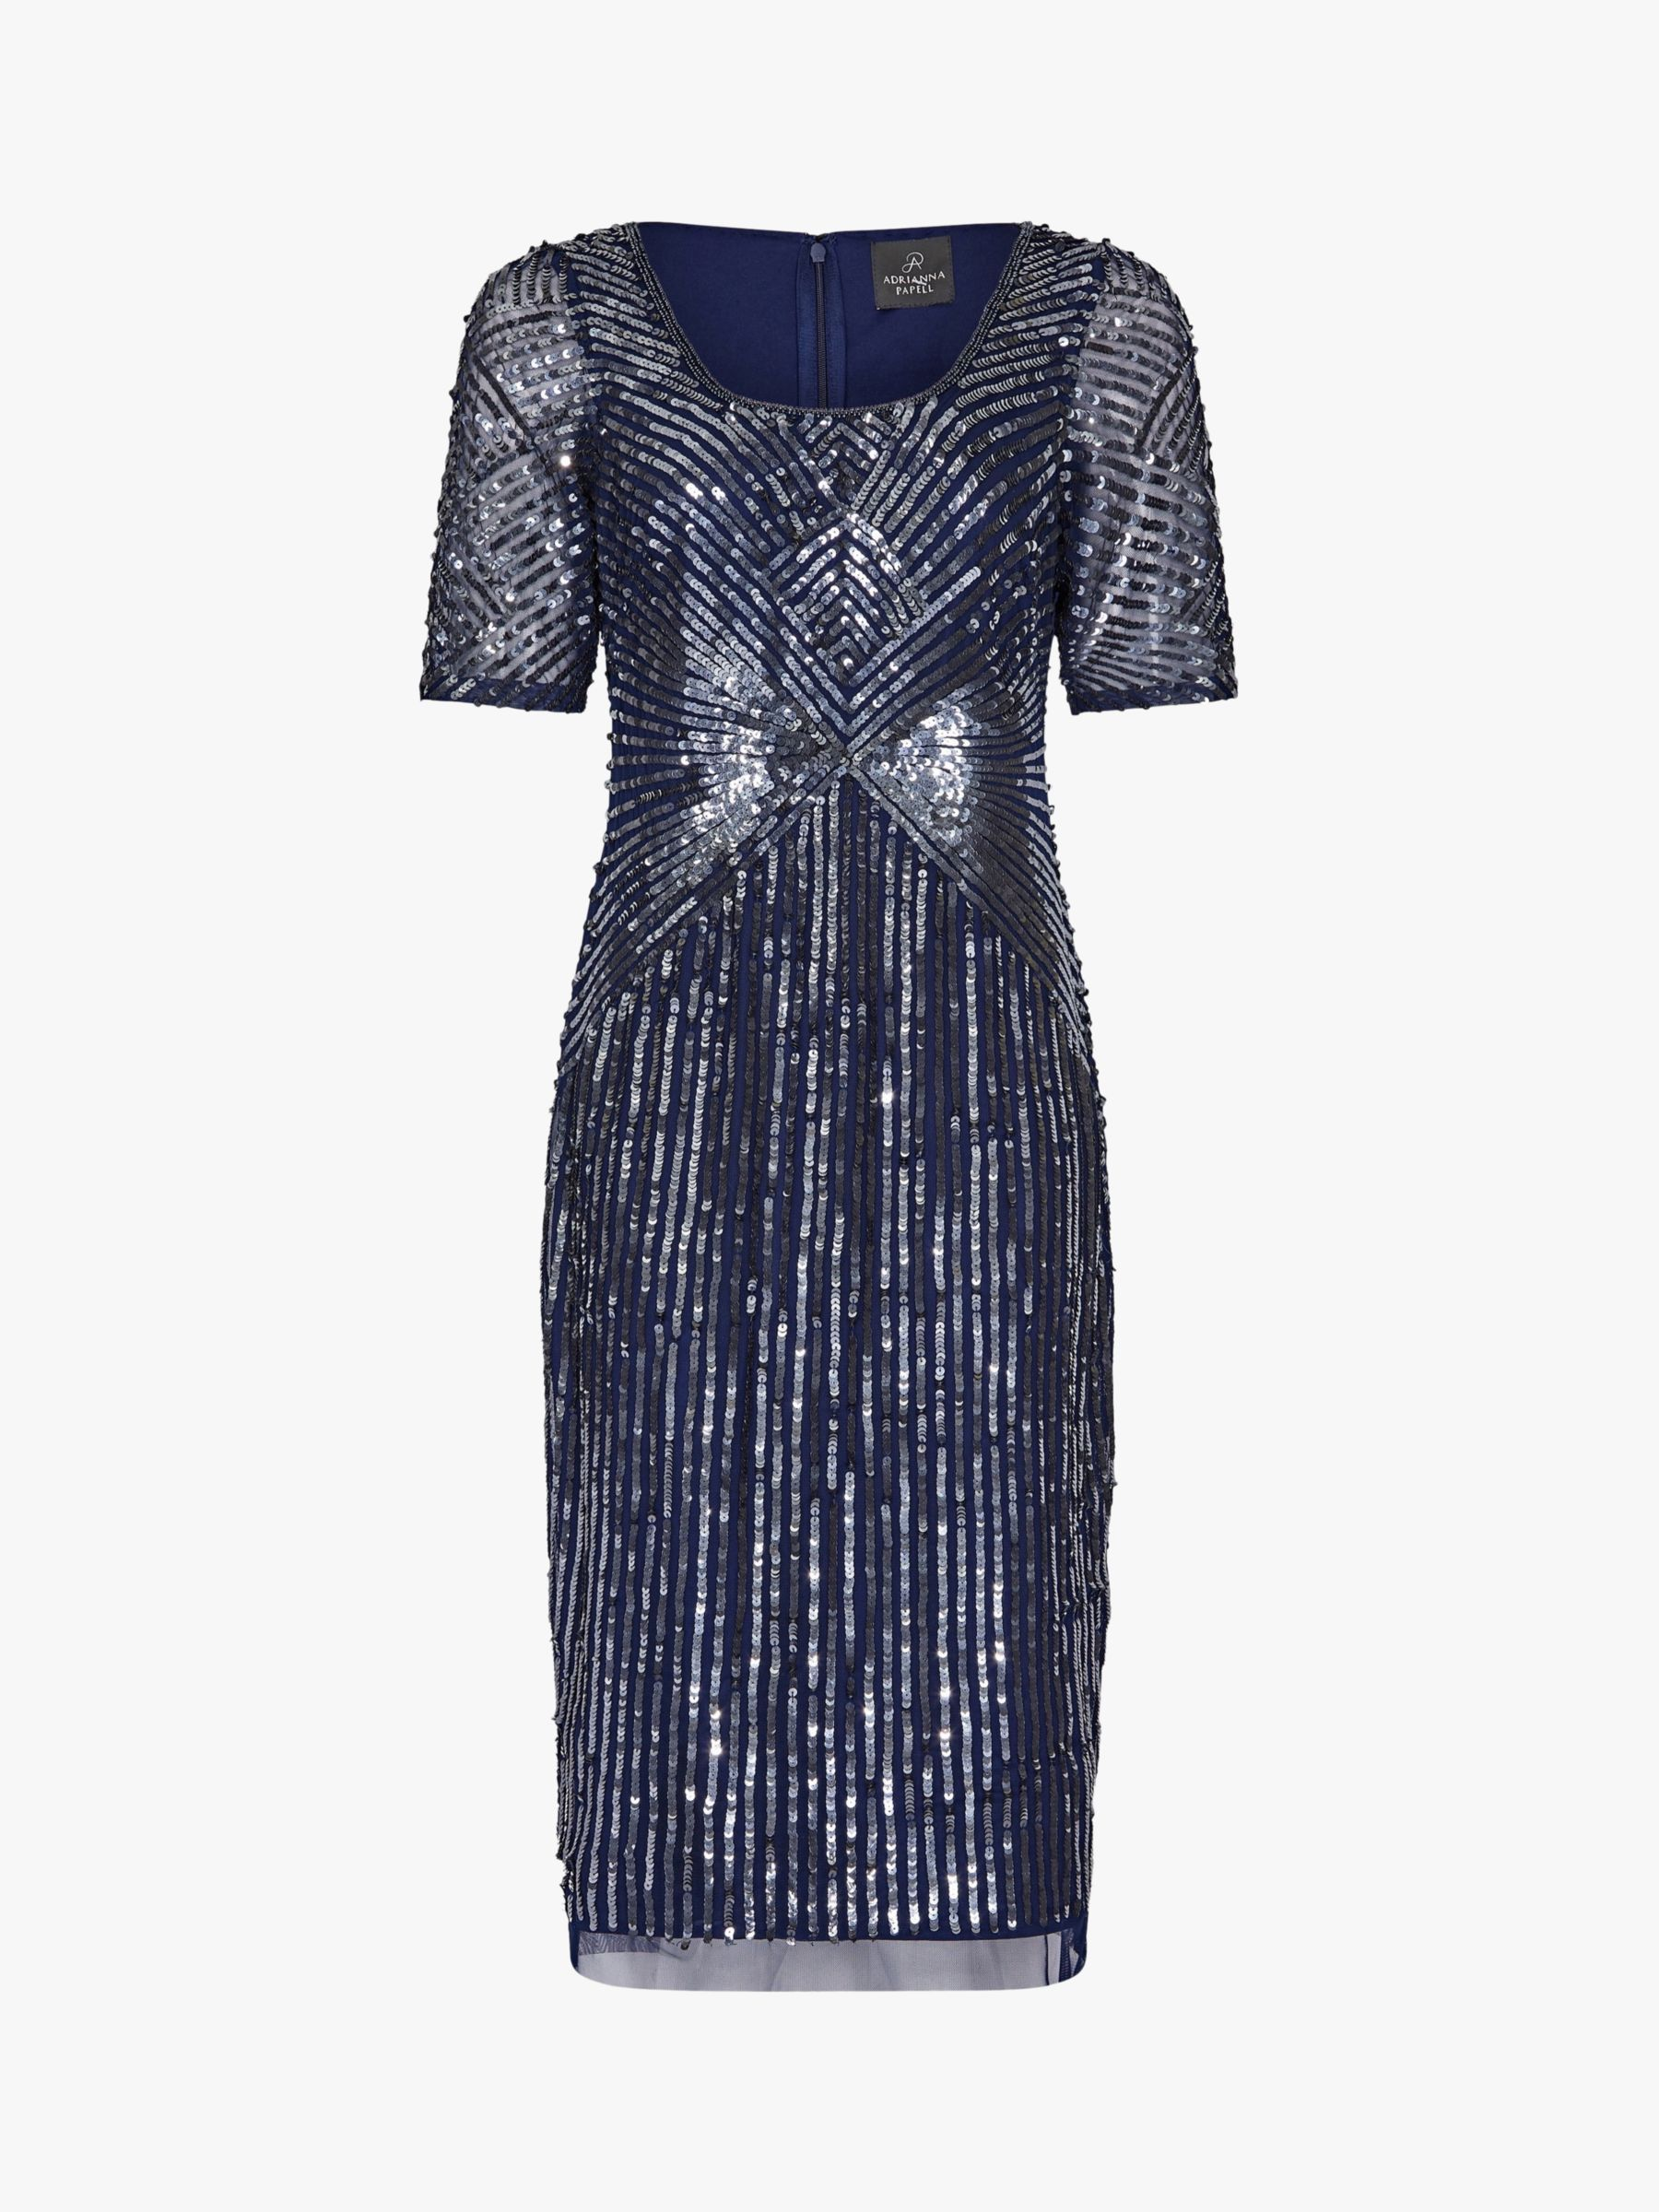 Adrianna Papell Beaded Knee Length Dress Navy Short Sleeve Dresses Dress Shapes Fashion